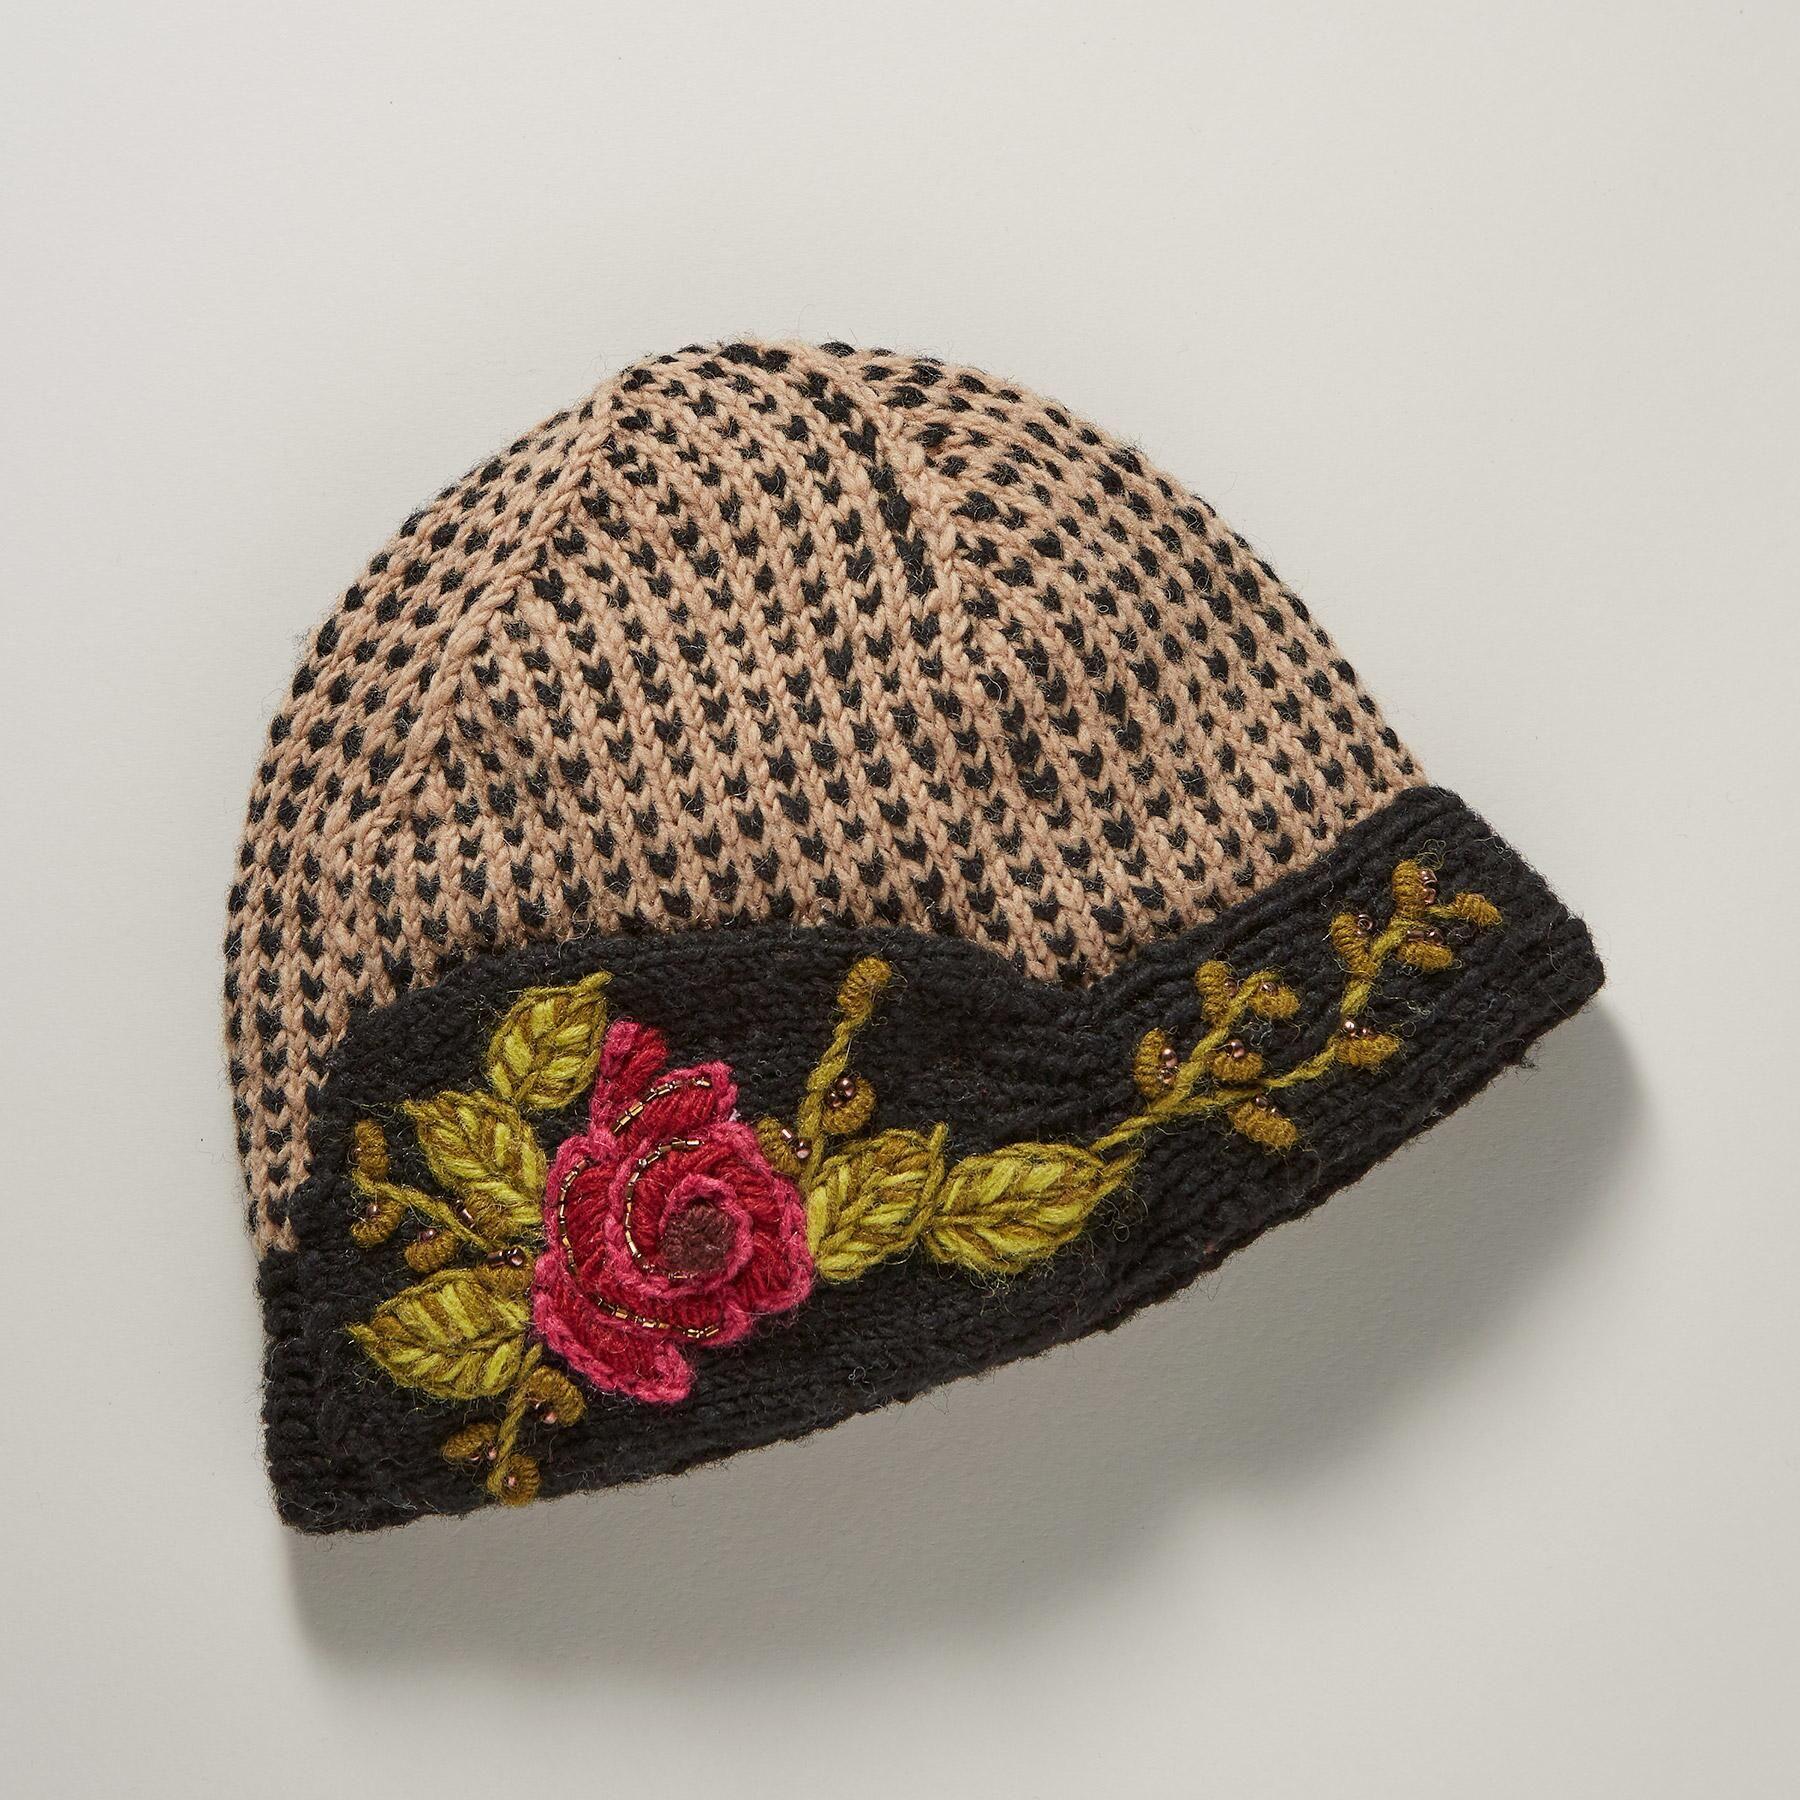 LUMI HAT -- Timeless glamour 66414e6f7a9